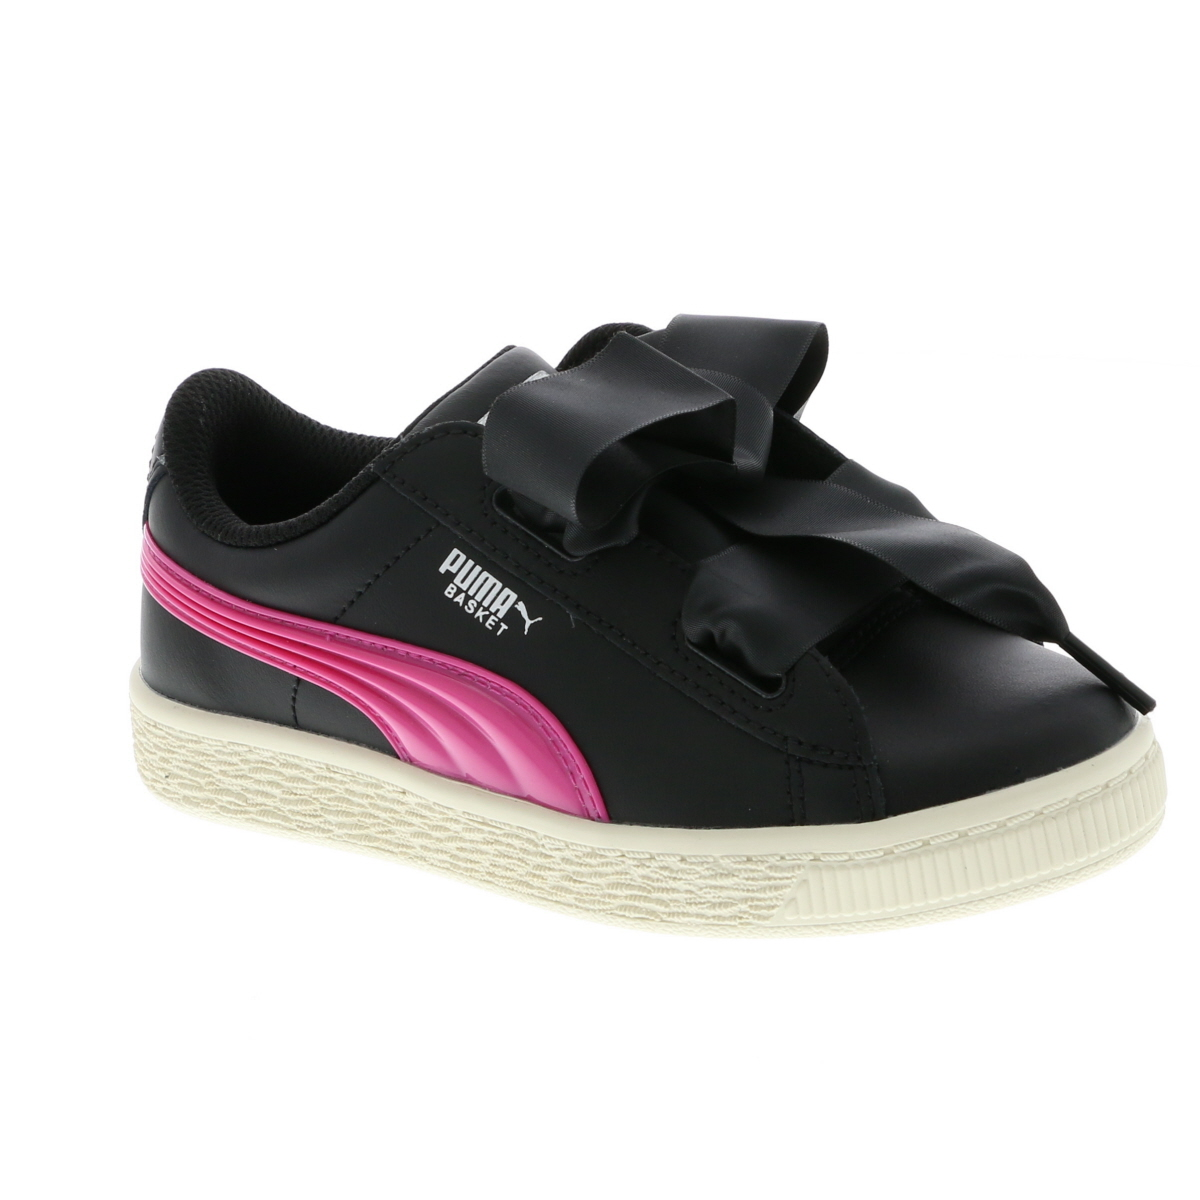 adidas performance schoenen kind